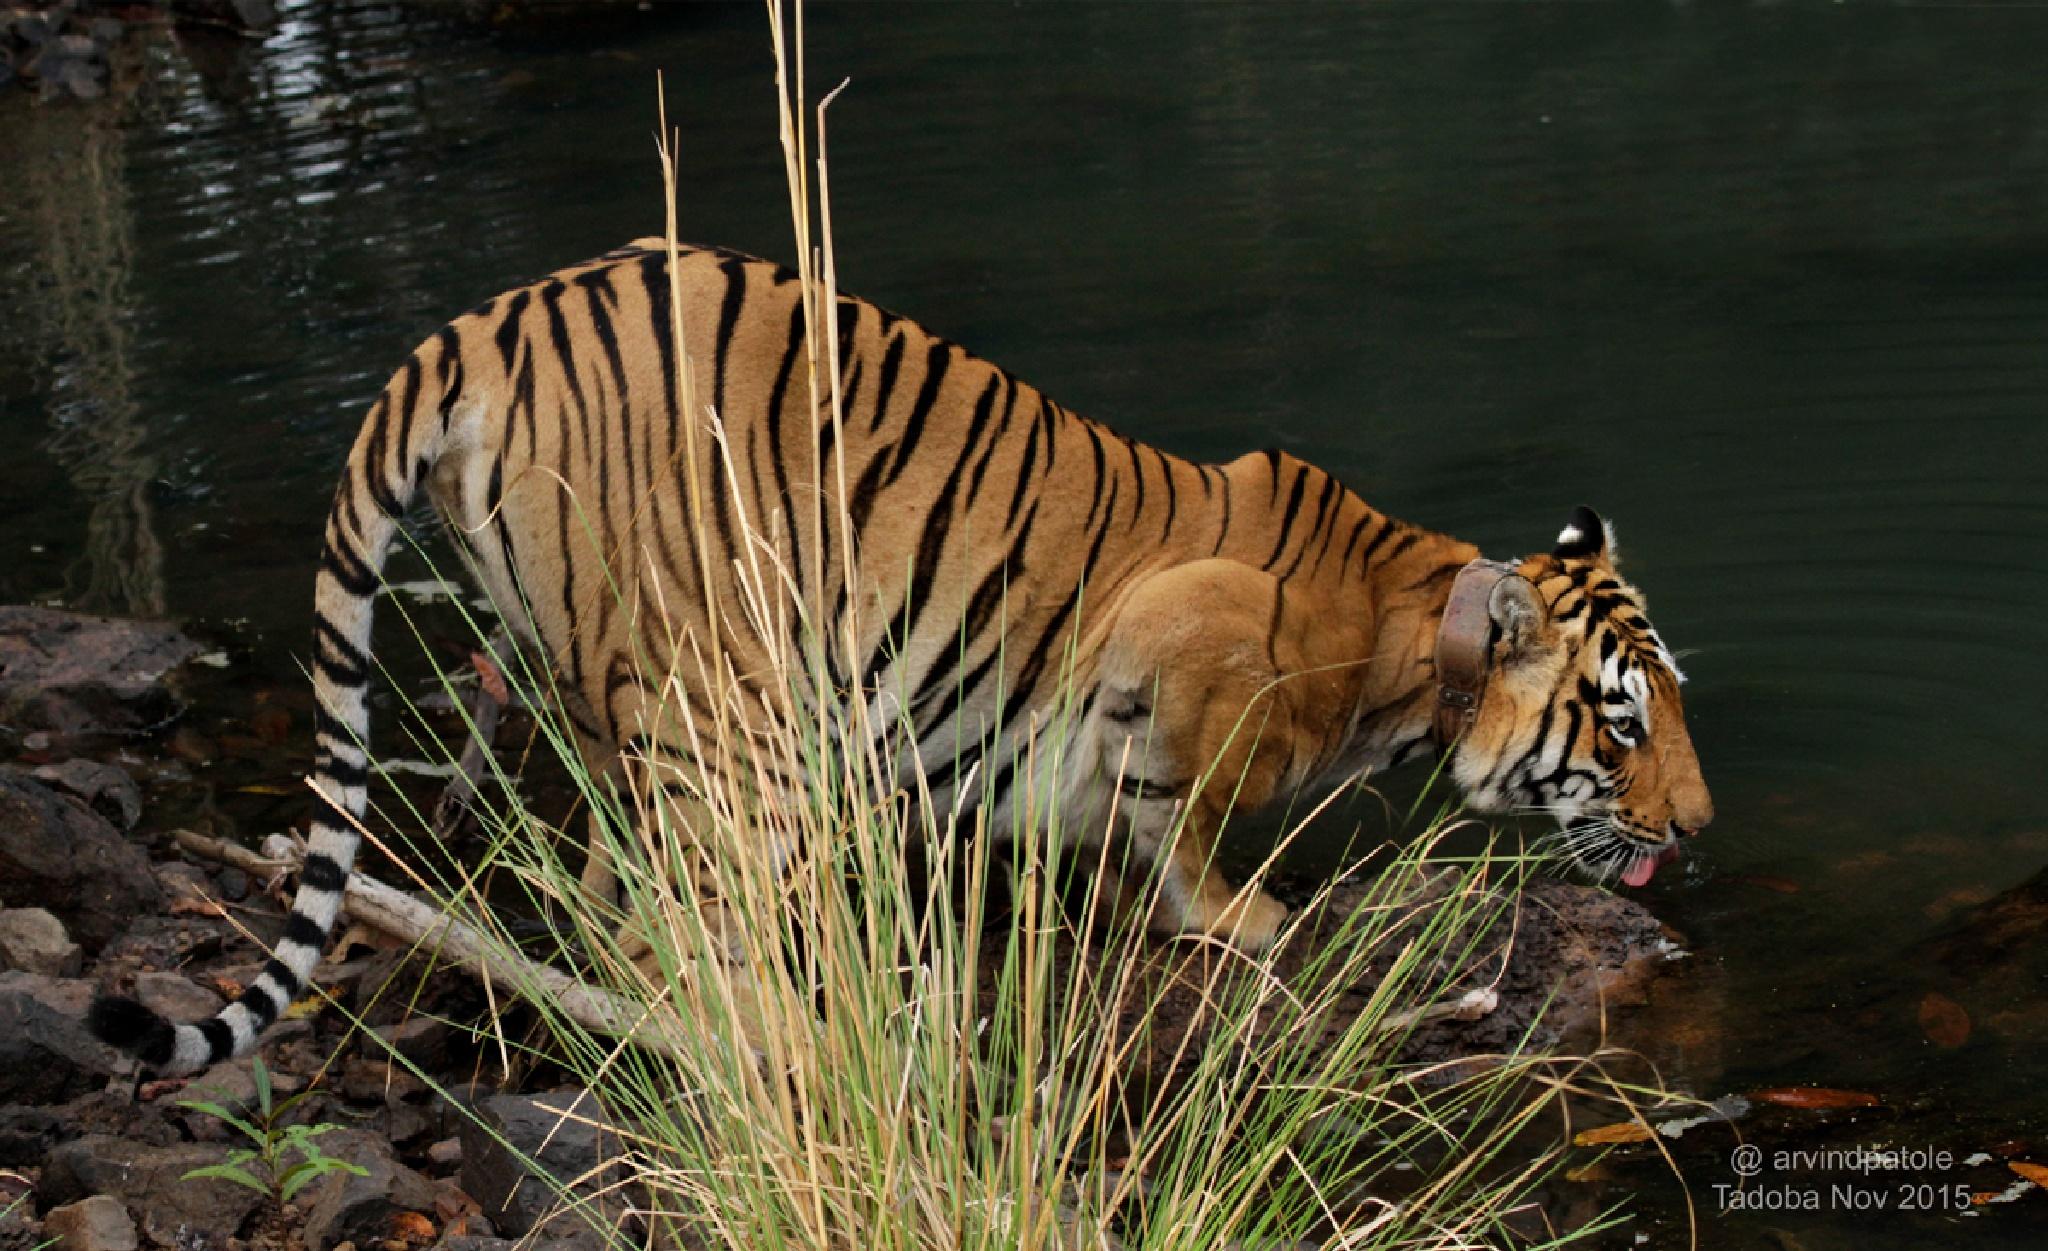 Tger, Wildlife, Tadoba,  by arvindpatole